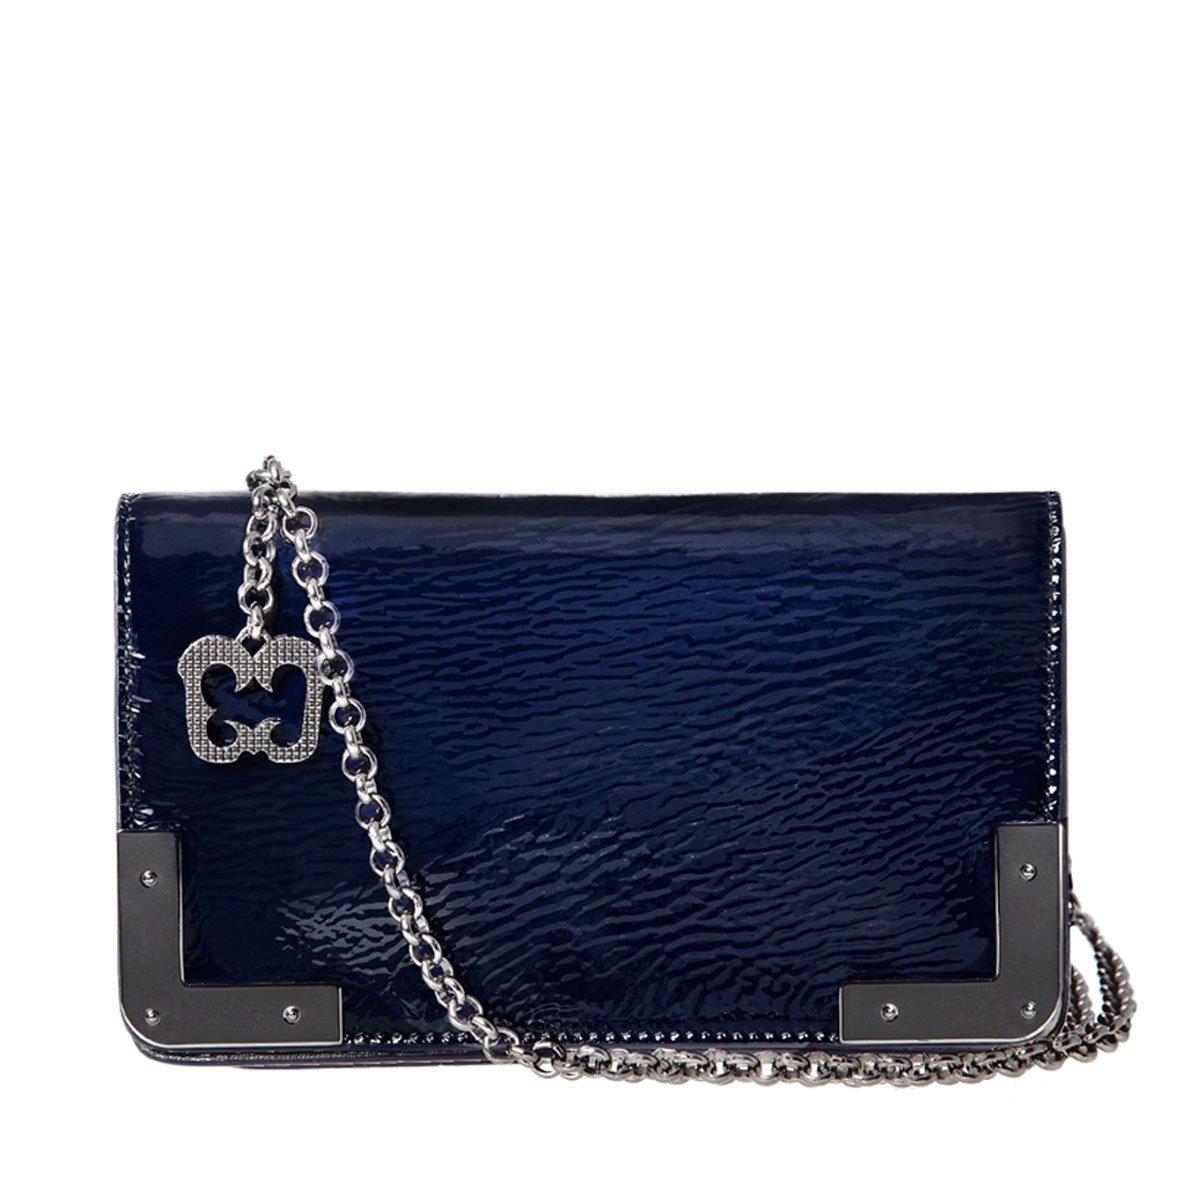 Eric Javits Luxury Fashion Designer Women's Handbag - Cassidy - Navy Mix